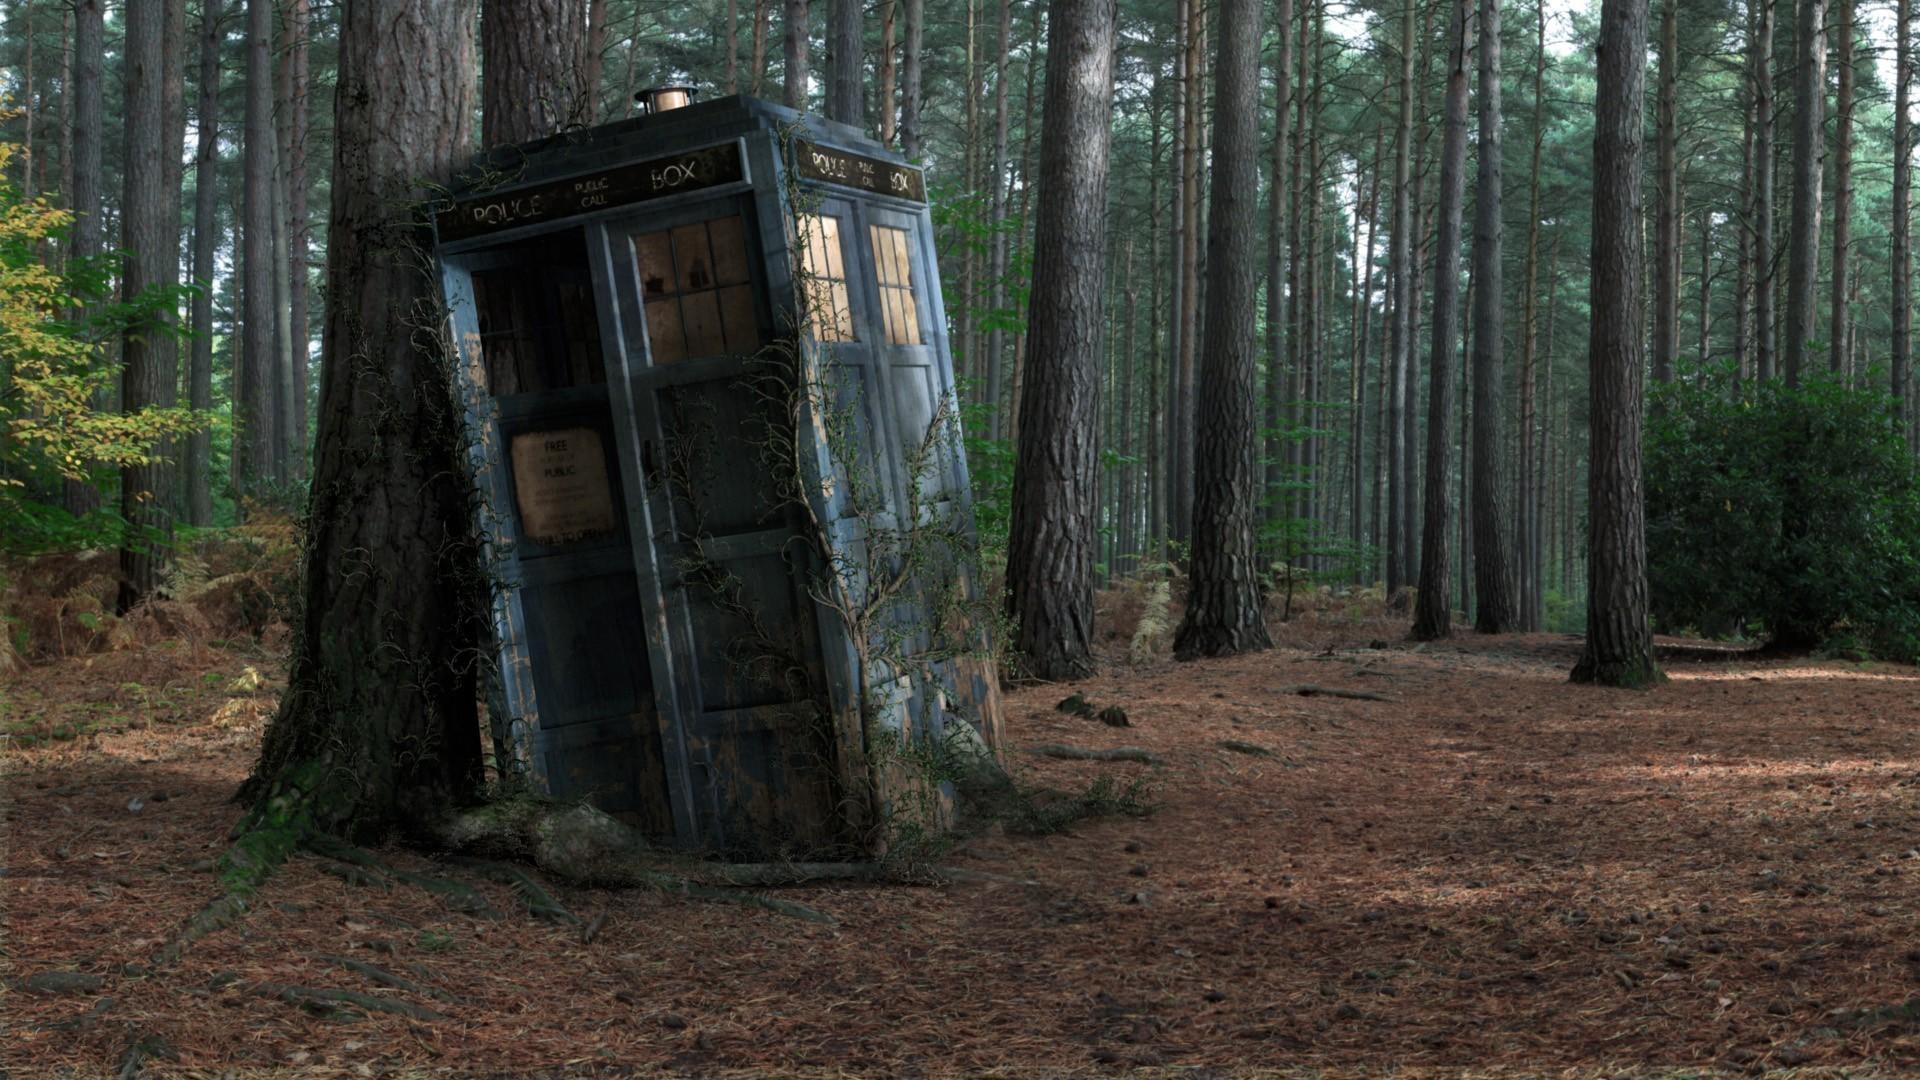 Top Doctor Who Tardis Interior Photo